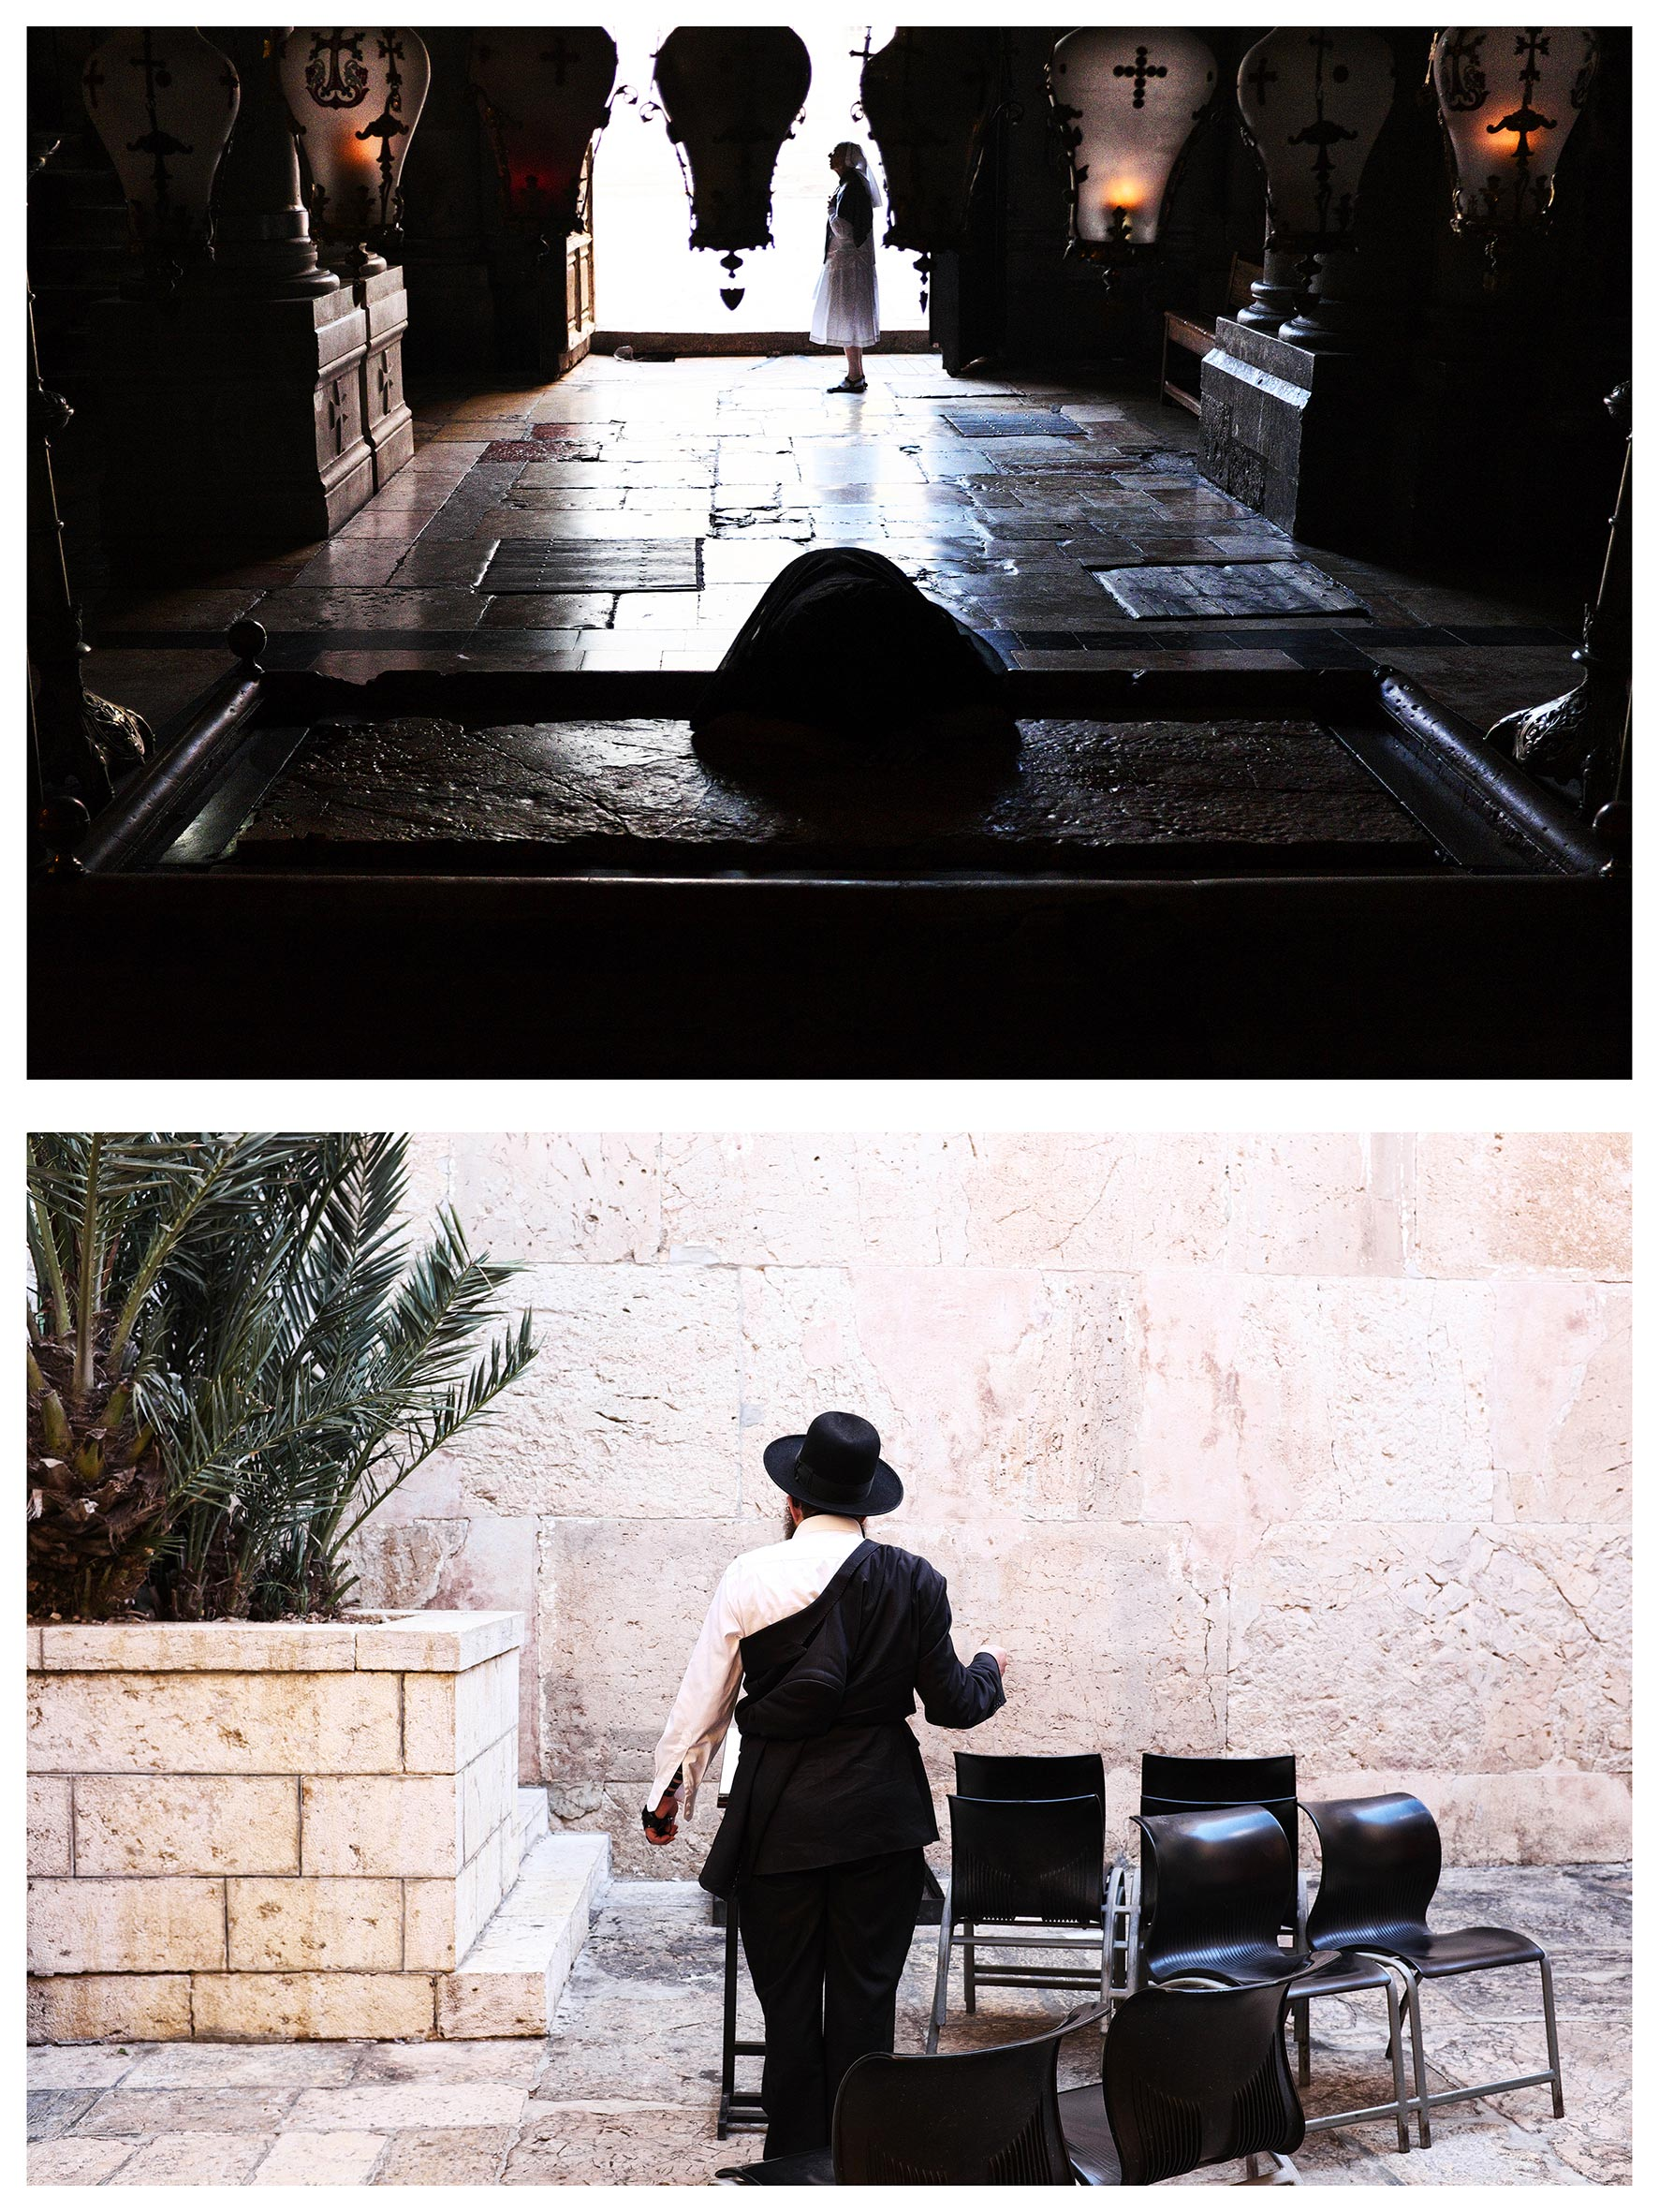 #au milieu un mur 9. Jérusalem / Hébron